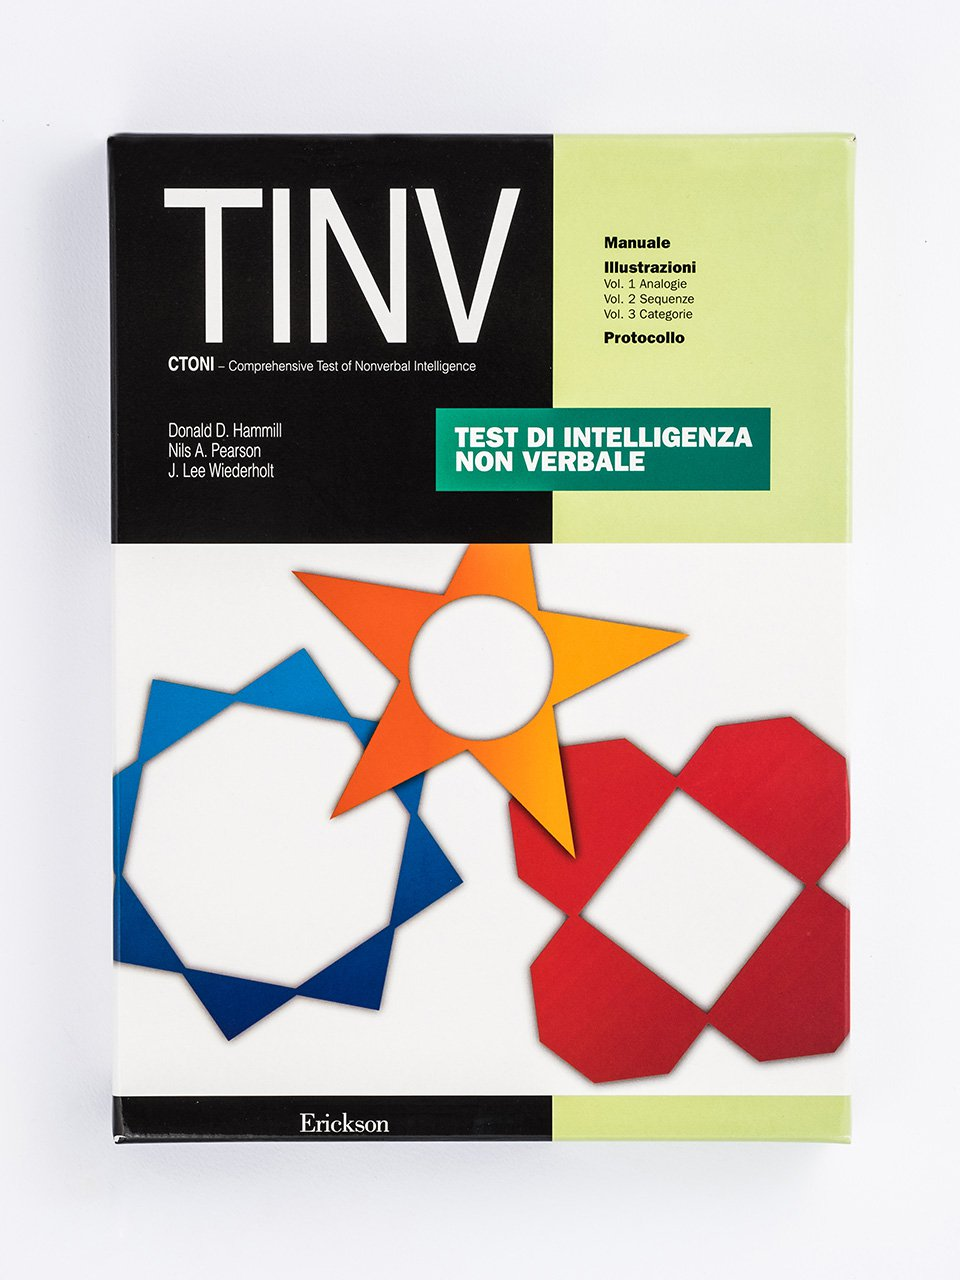 Test TINV - Intelligenza non verbale - Libri - Strumenti - Erickson